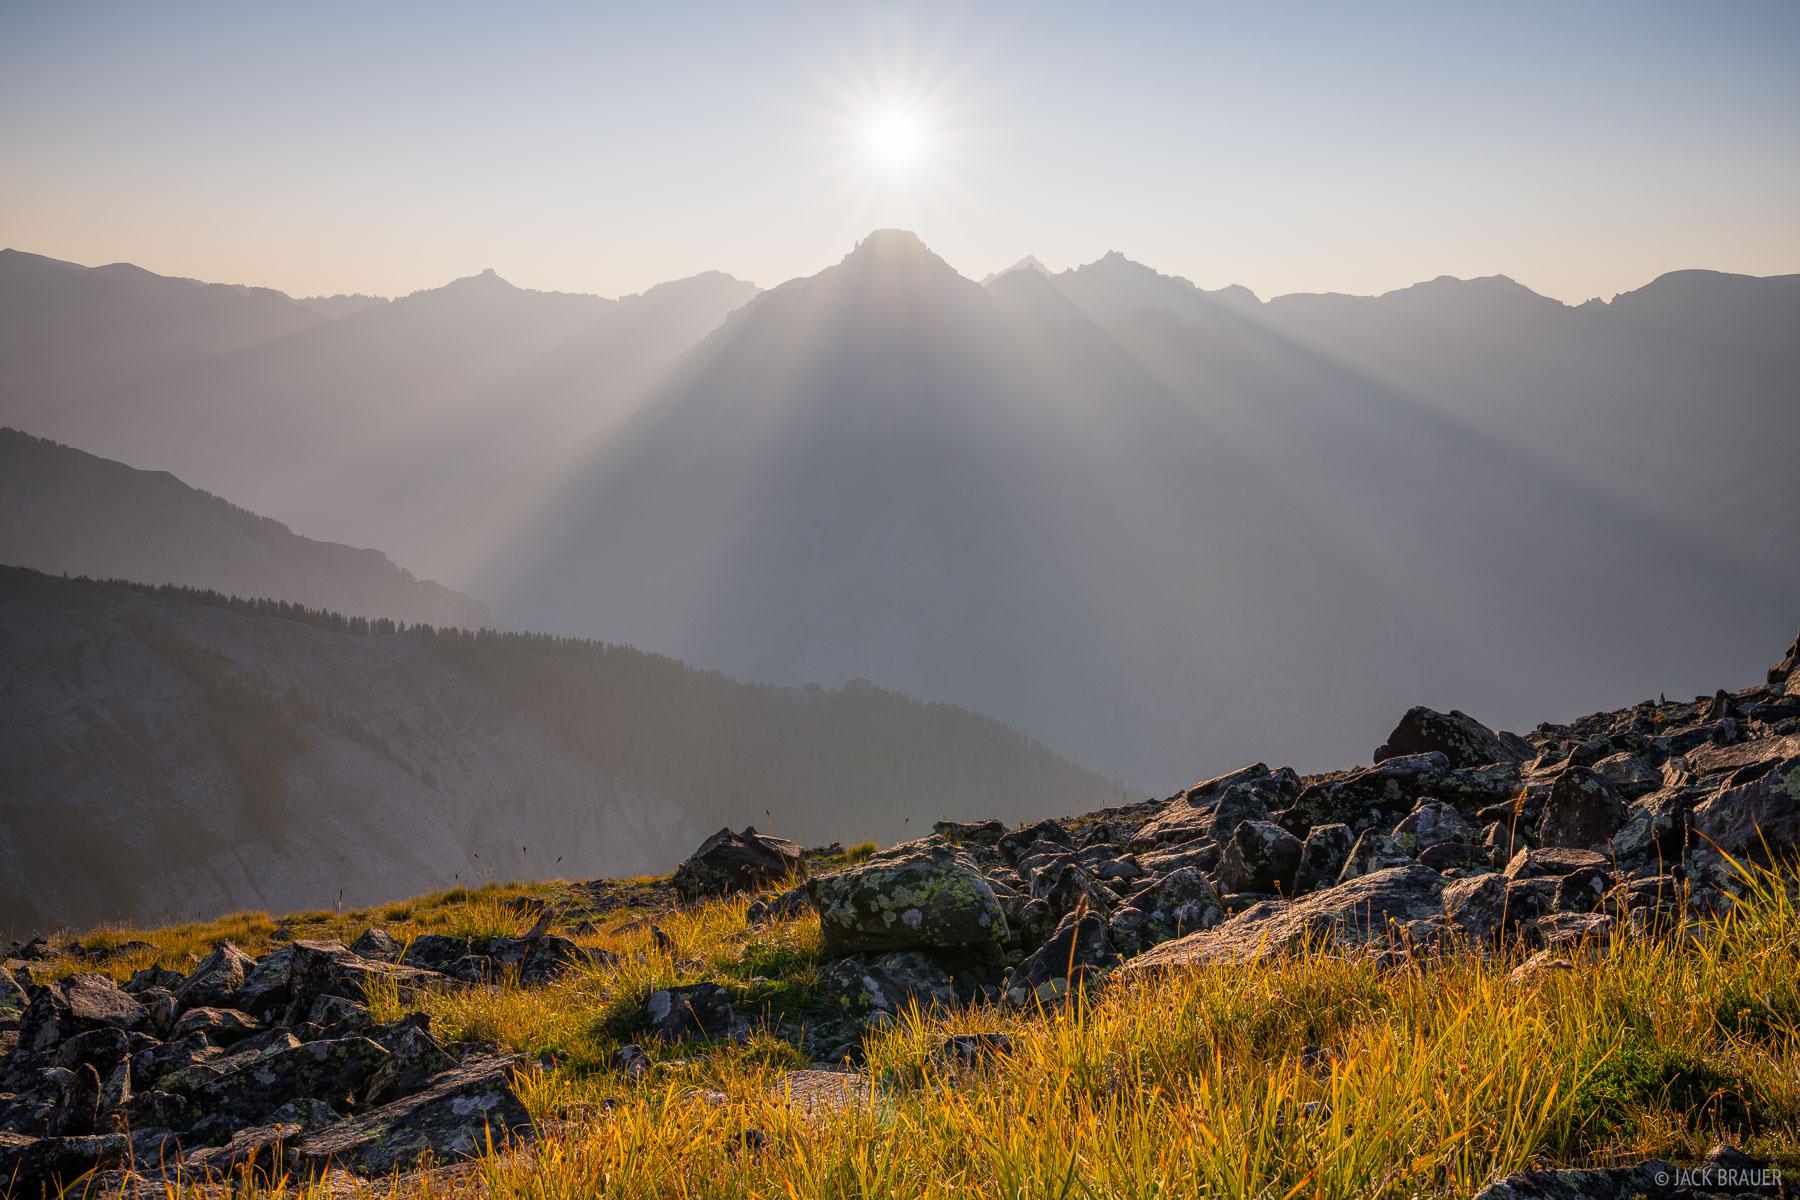 Setting sun over Potosi Peak on a hazy August evening.